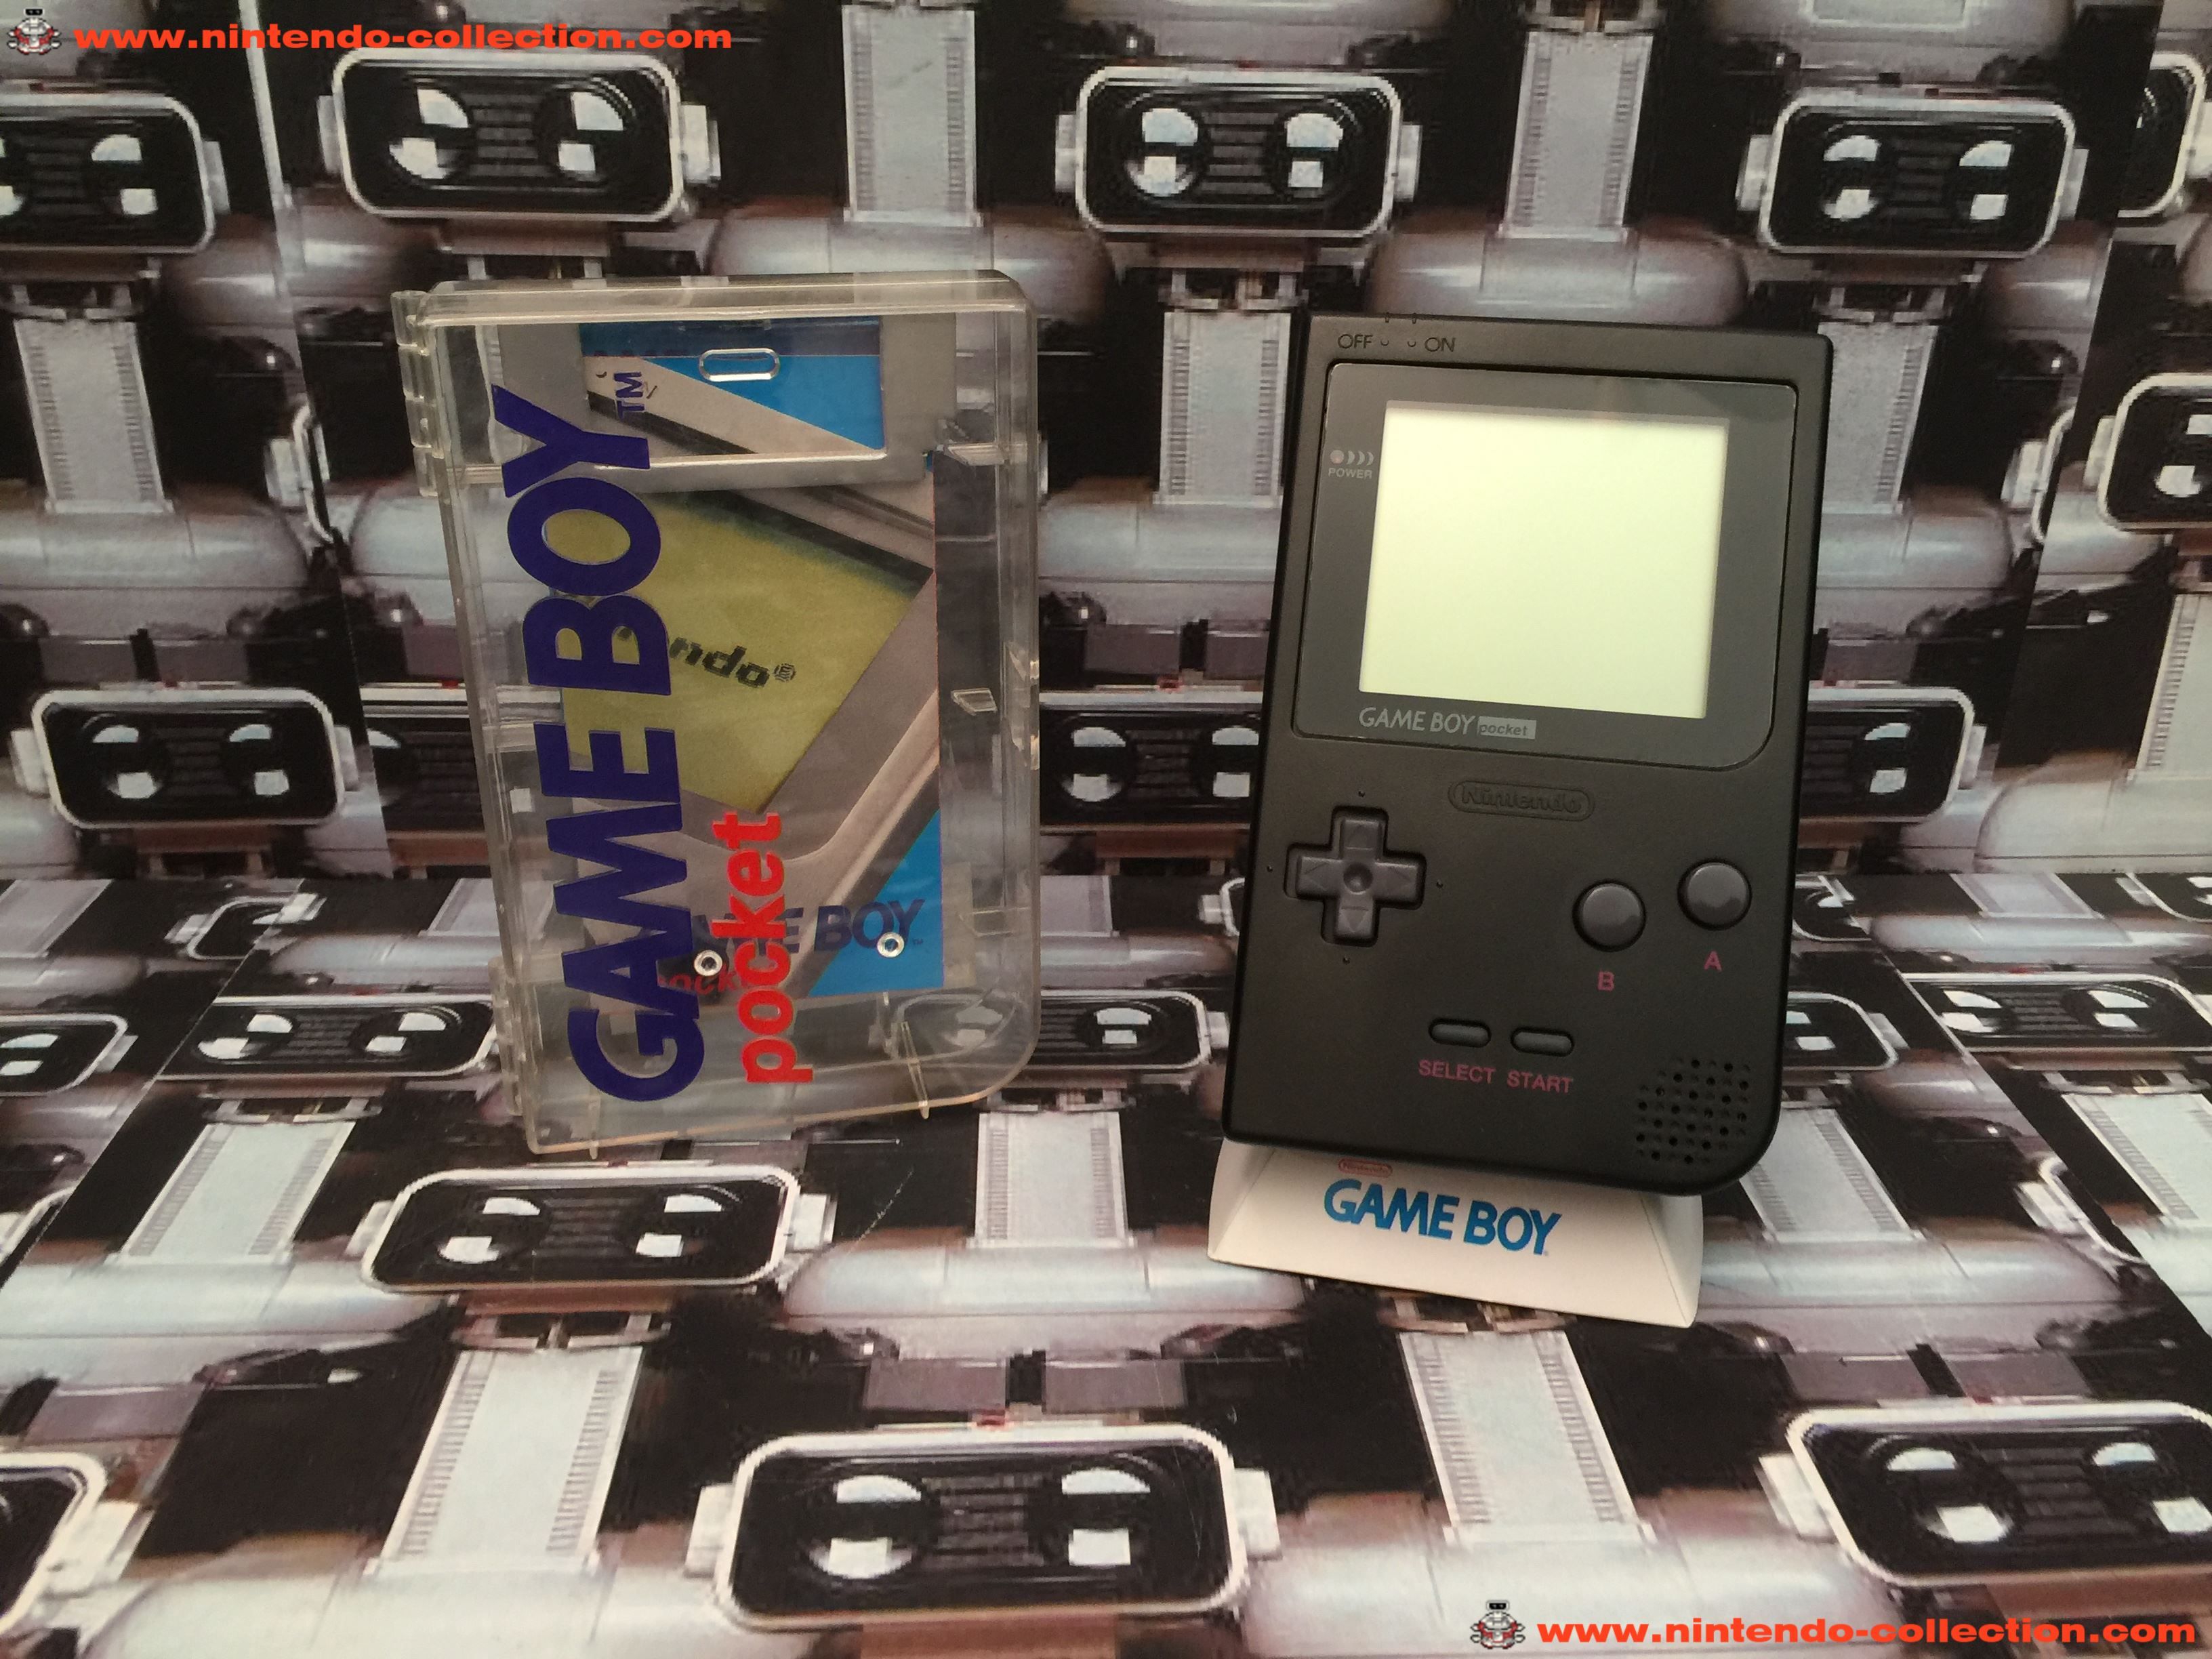 www.nintendo-collection.com - Gameboy Pocket GB Black Noir Crystal Box - 01